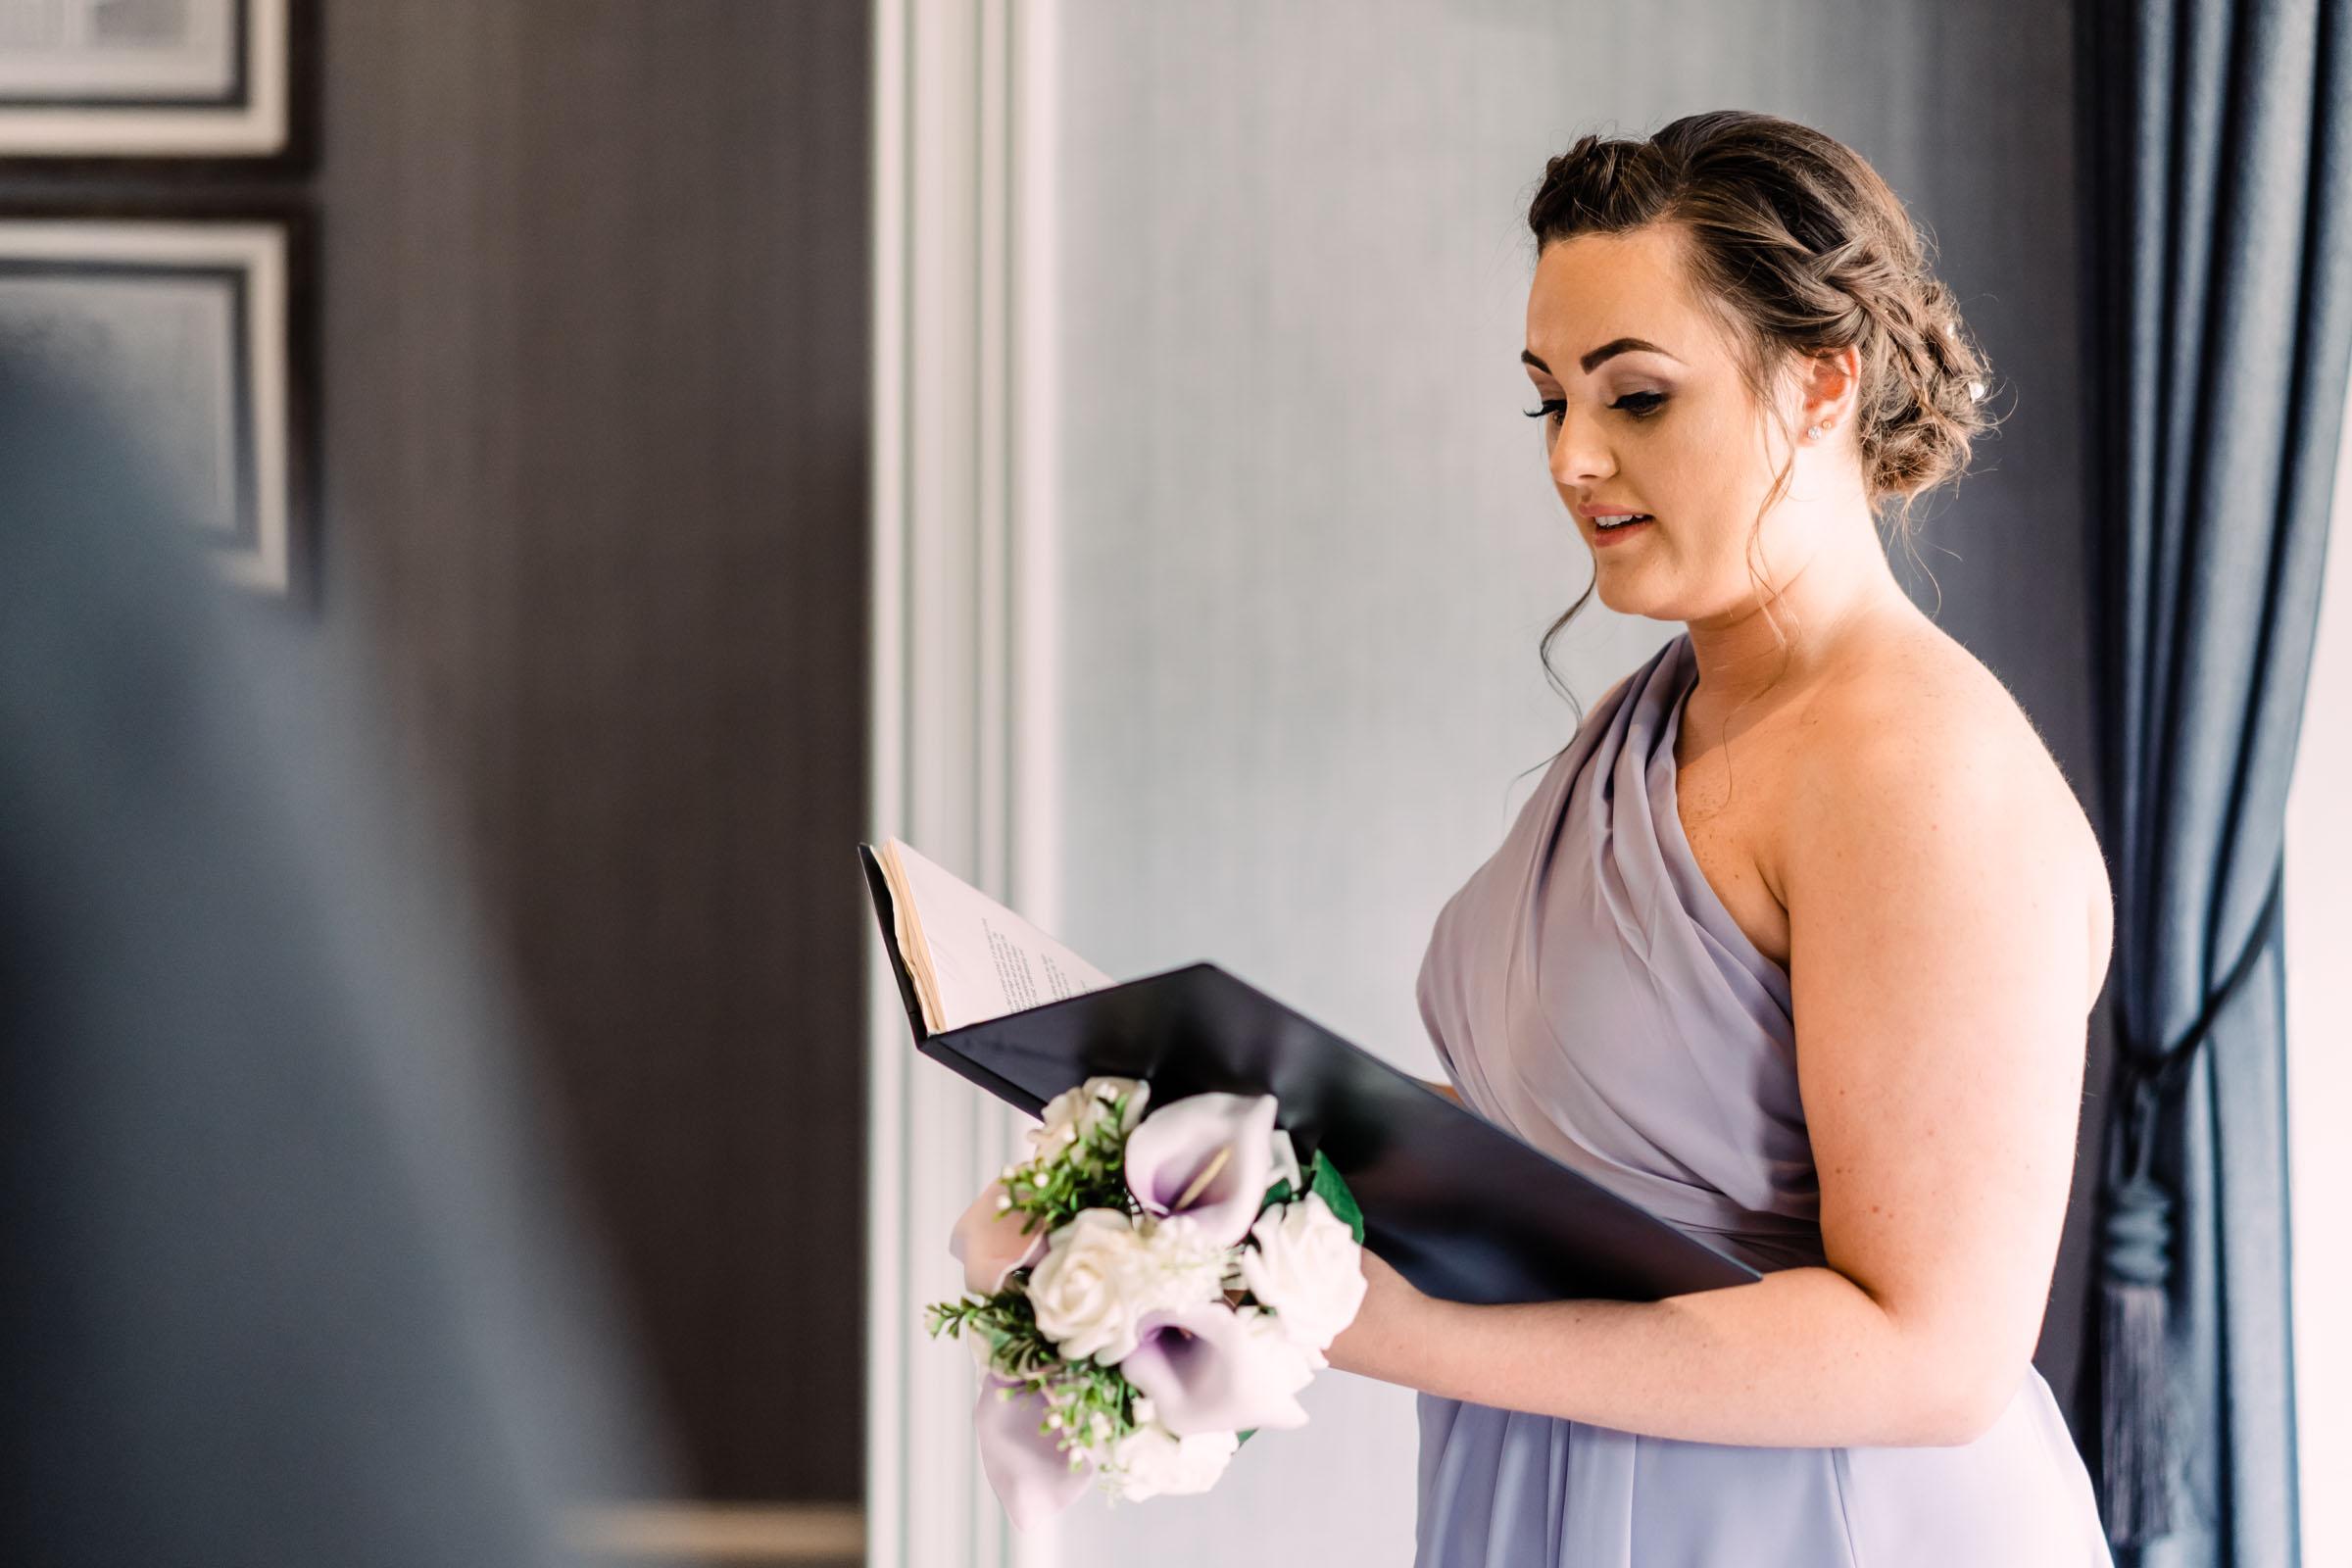 motherwell-moorings-wedding-photographer-dearlyphotography (35 of 77).jpg